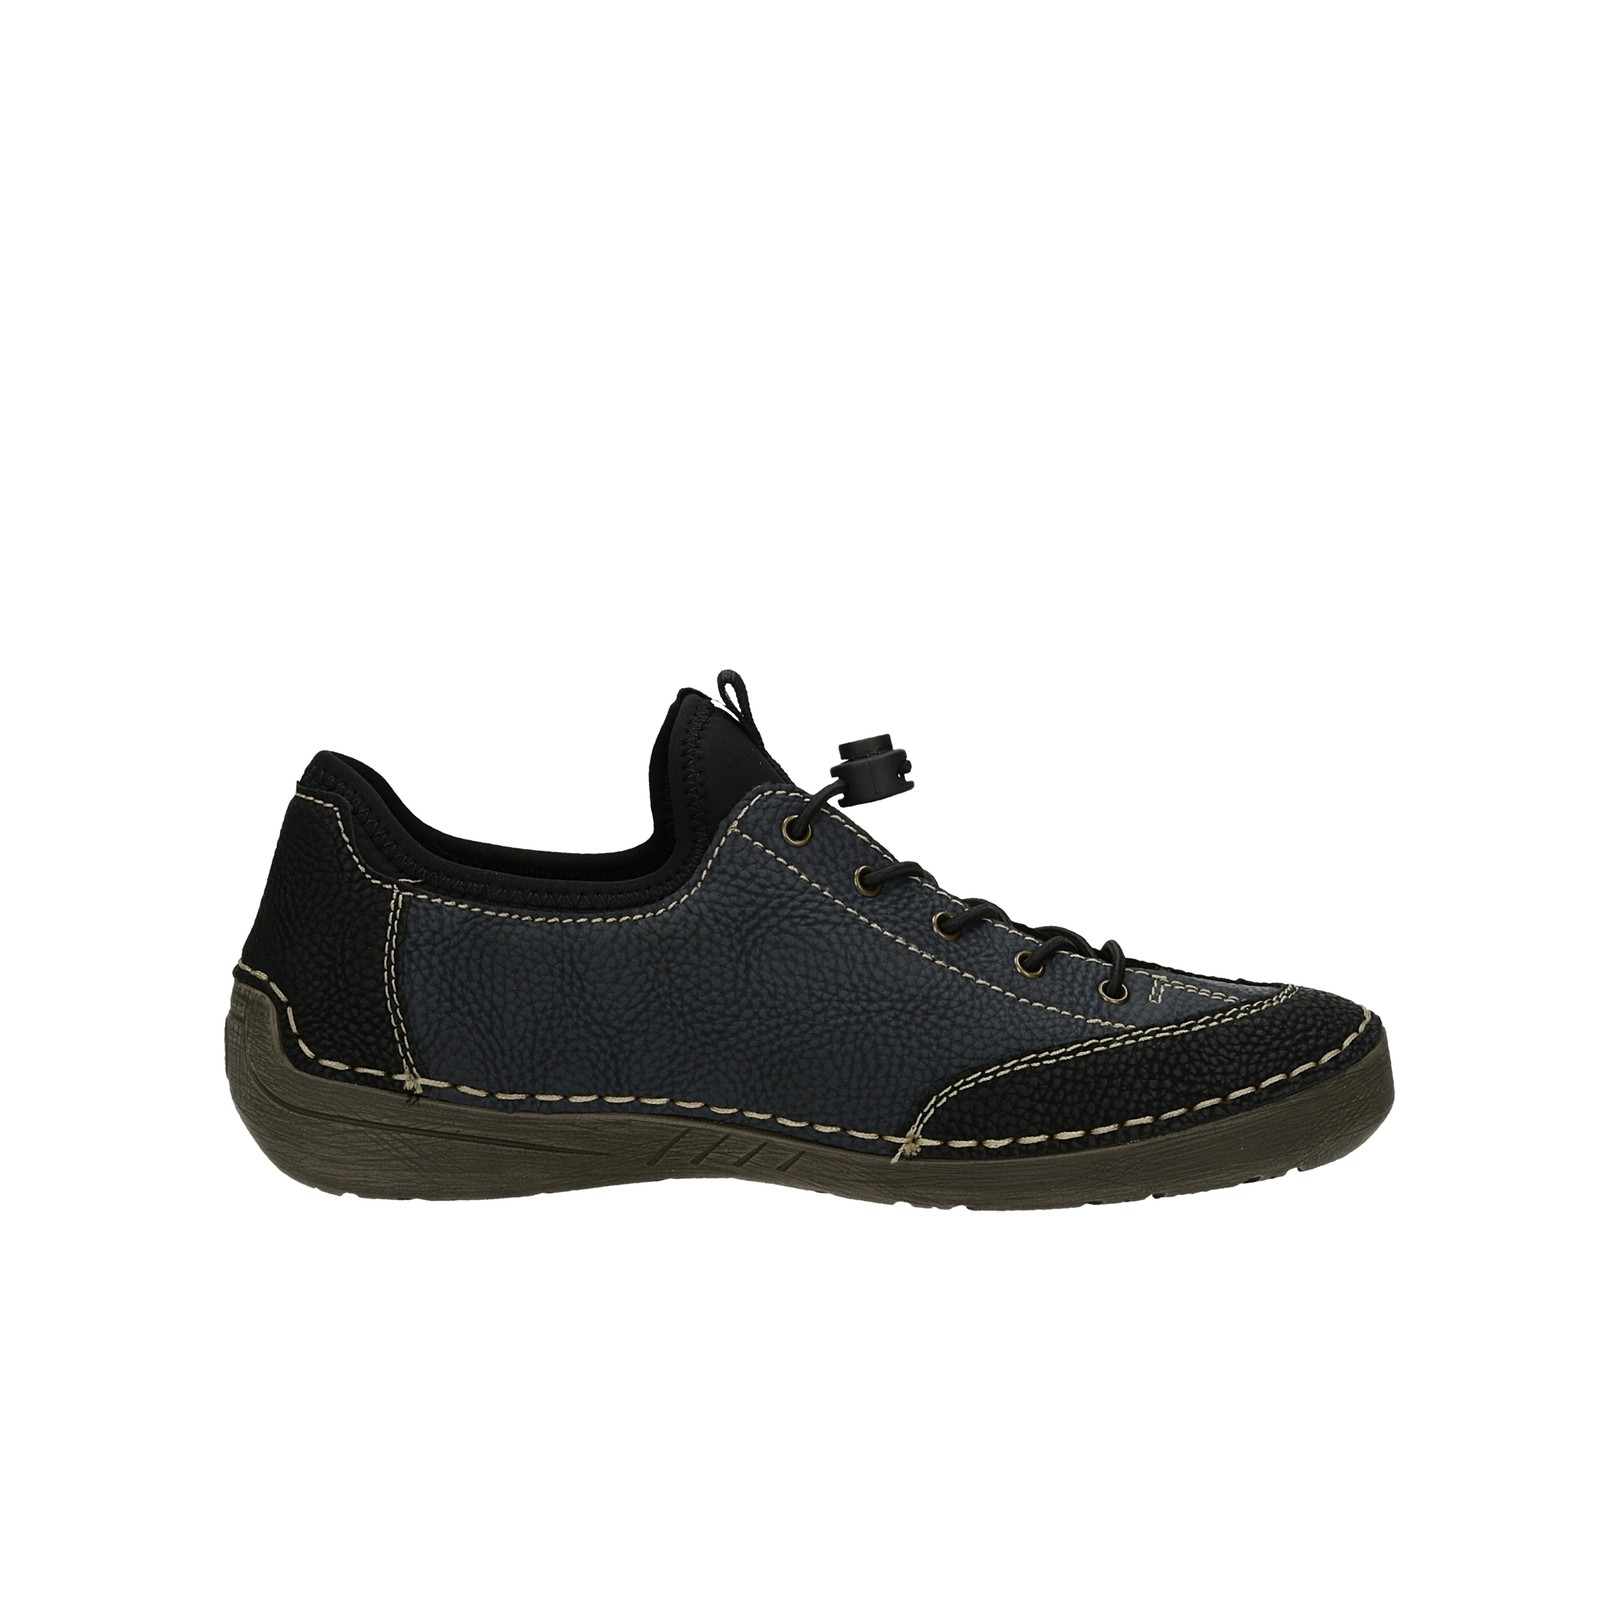 Rieker dámske štýlové tenisky - čierne